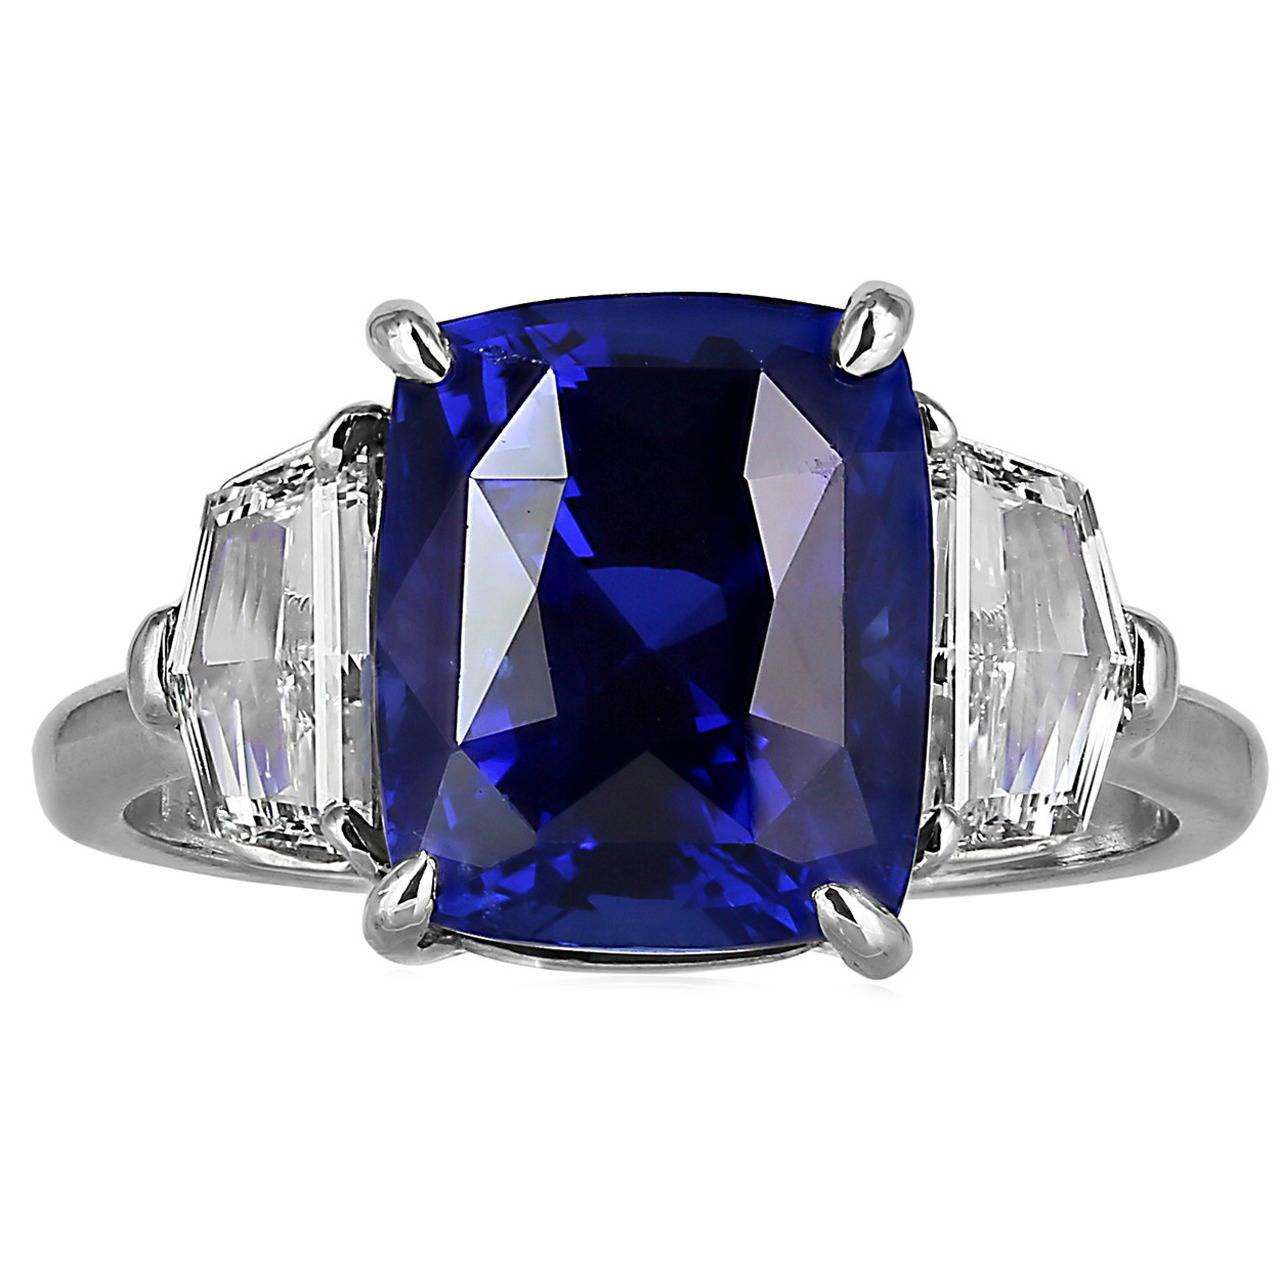 6.19 Carat GIA Certified Sapphire Diamond Platinum Three-Stone Ring